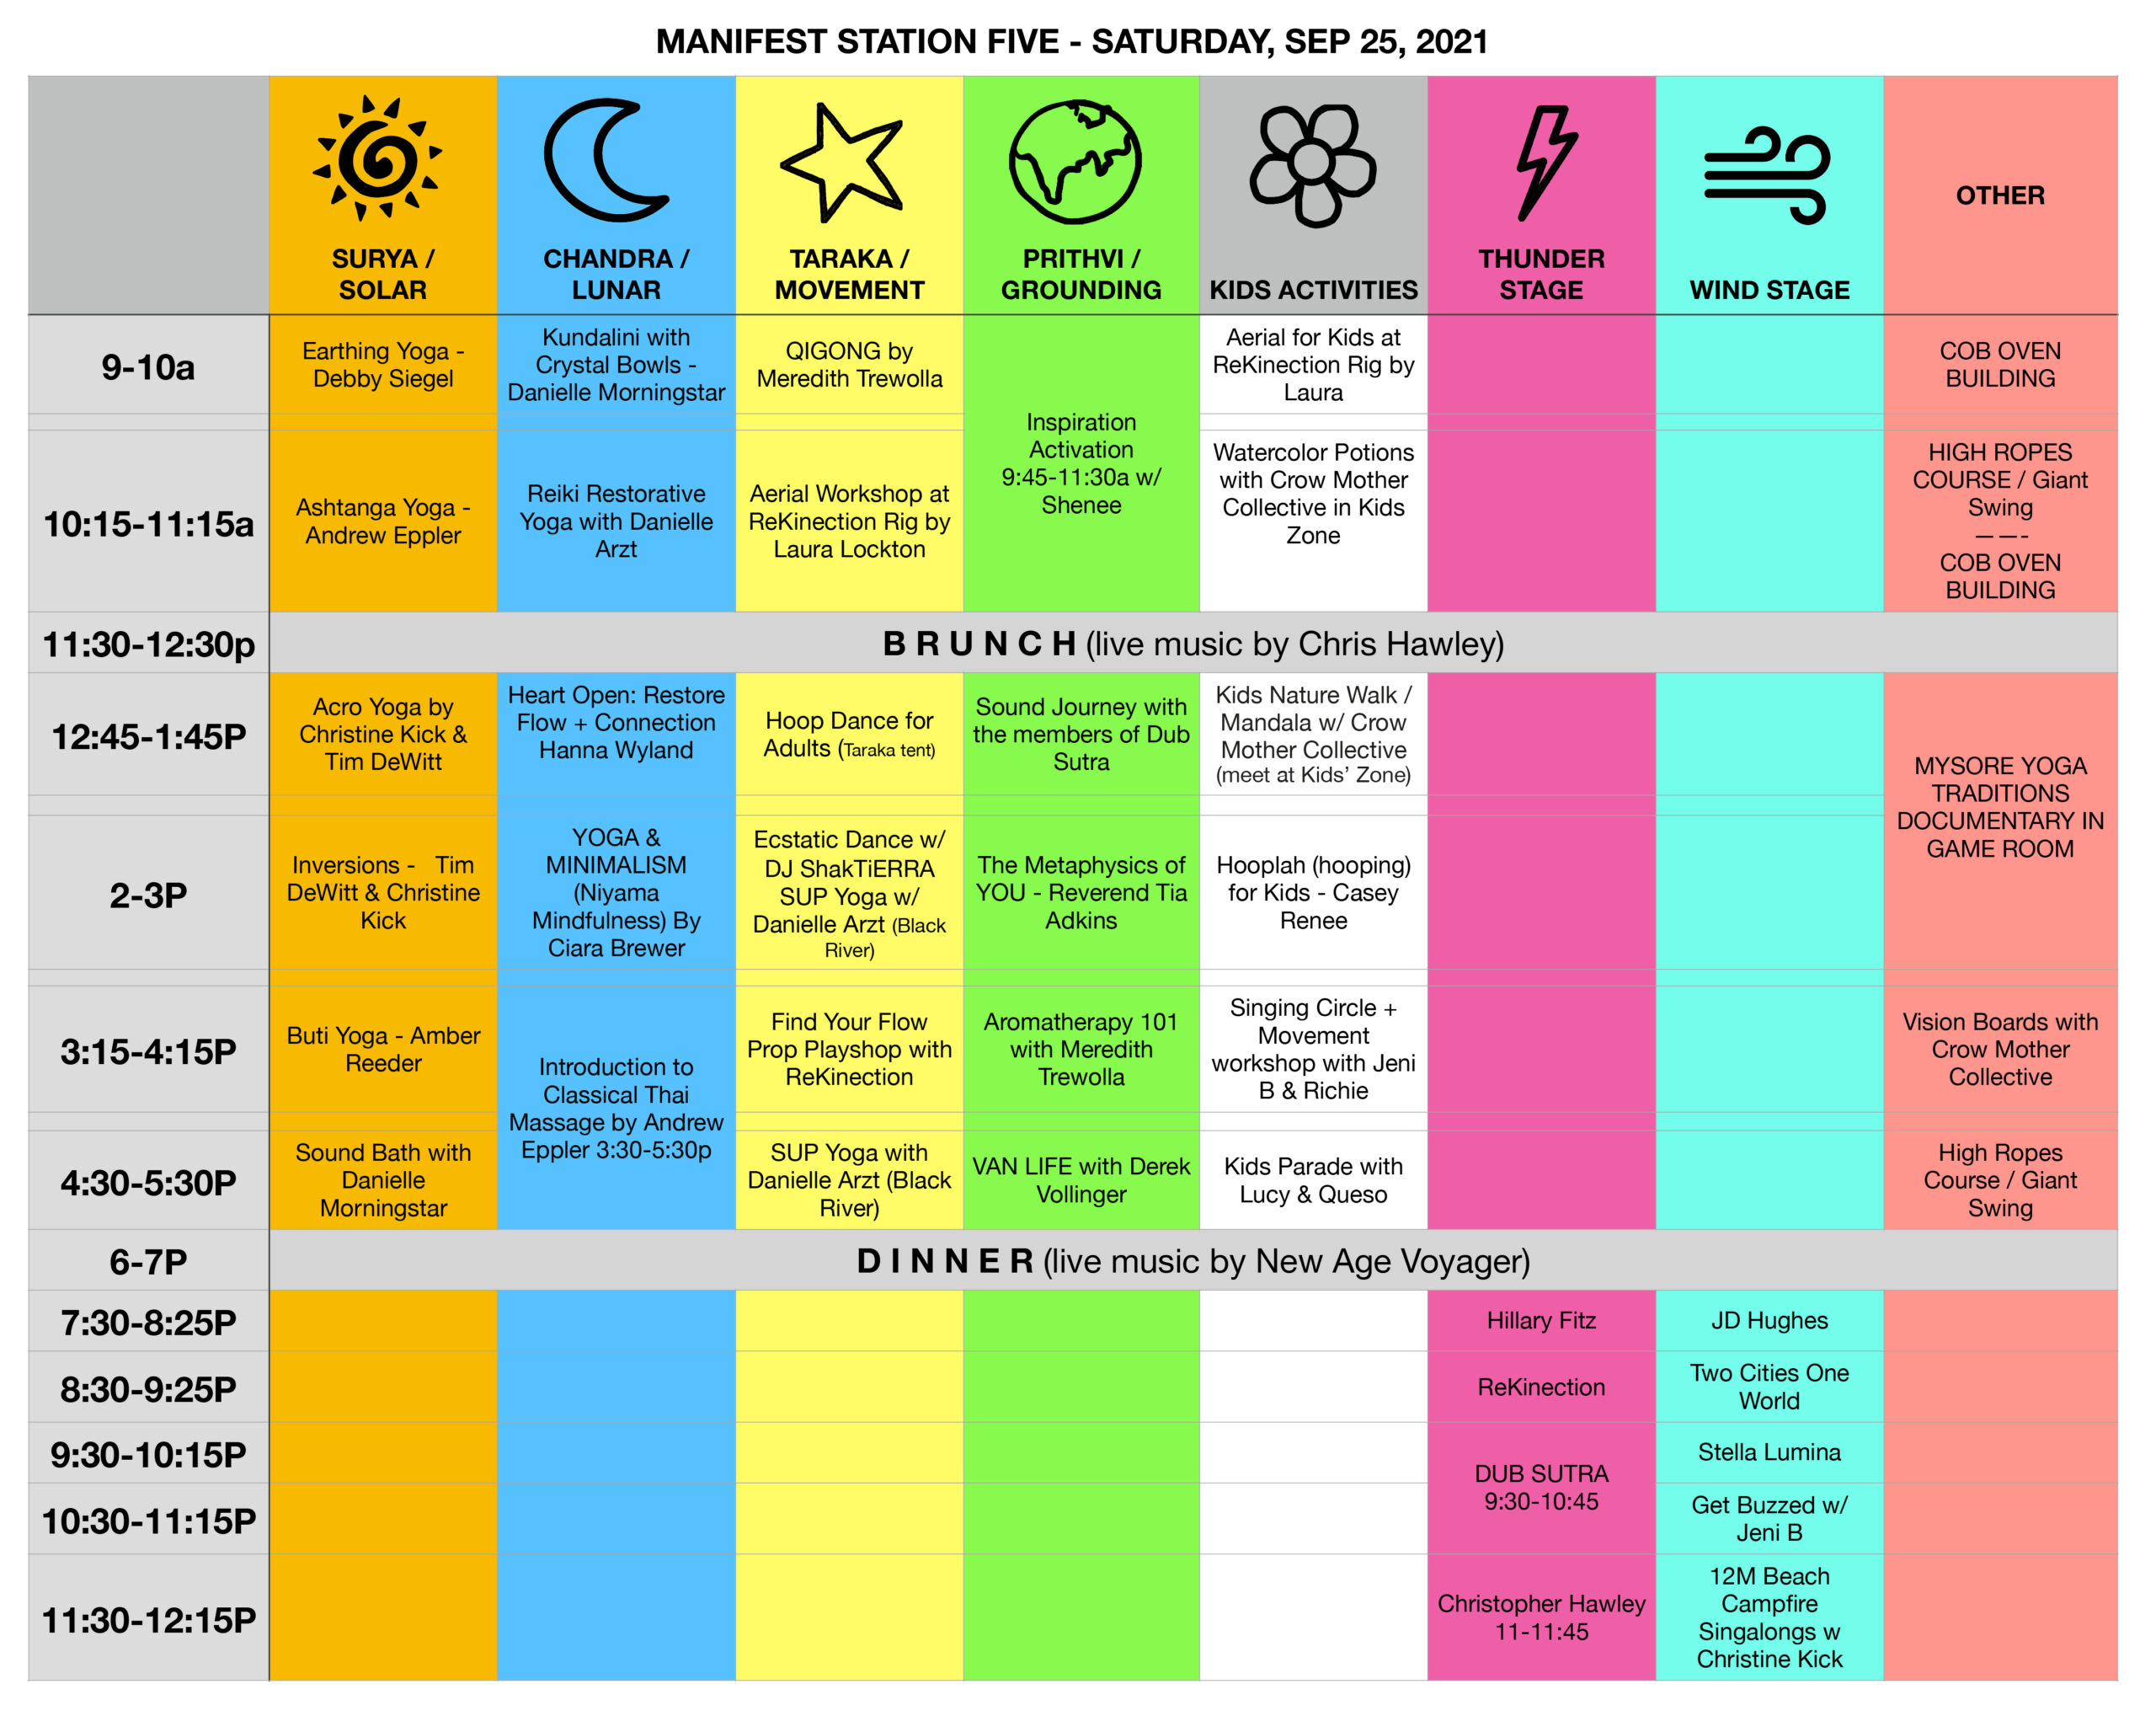 Manifest Station Music & Yoga Festival Schedule Sat Sep 25